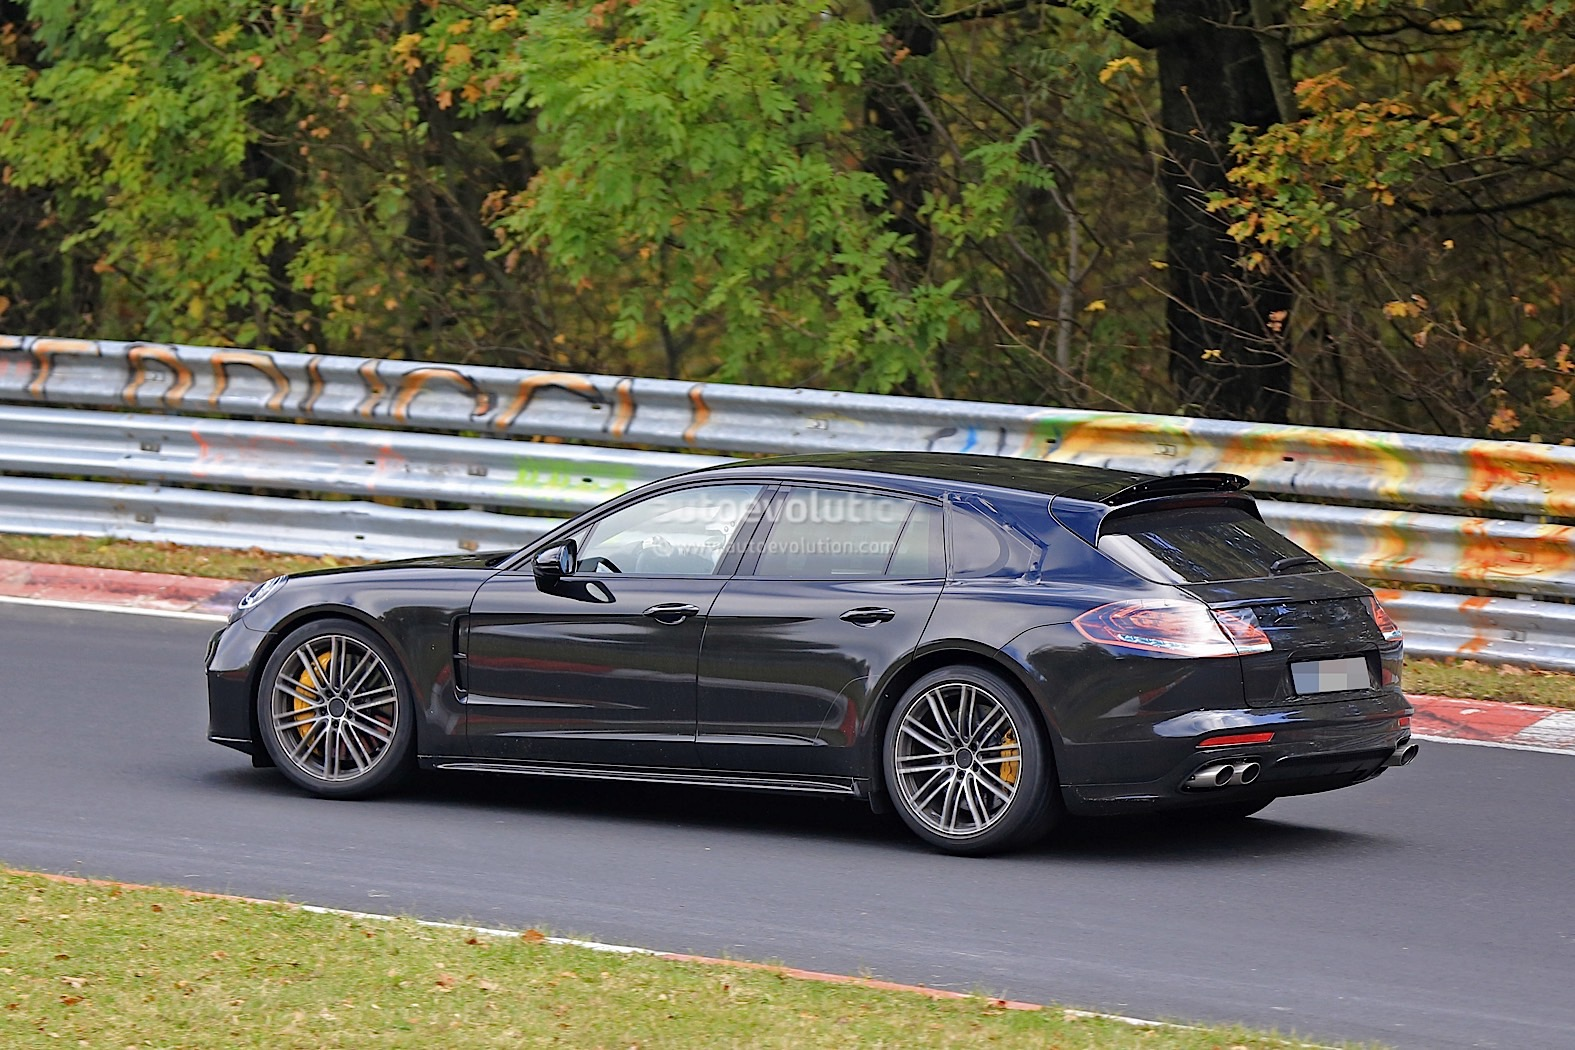 2018 Porsche Panamera Sport Turismo Wagon Spotted With